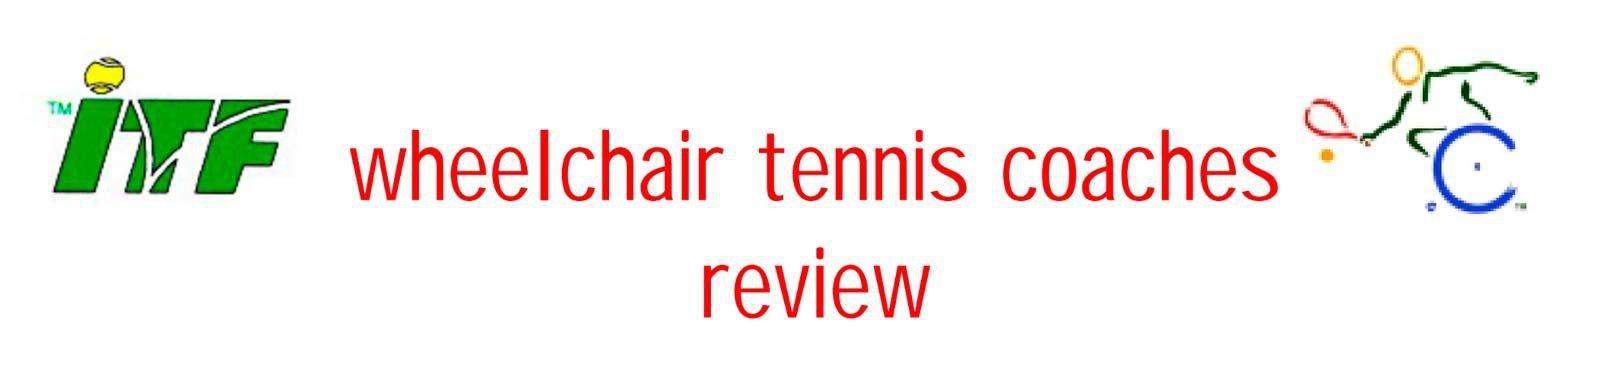 itf-wheelchair-tennis-coaches-review